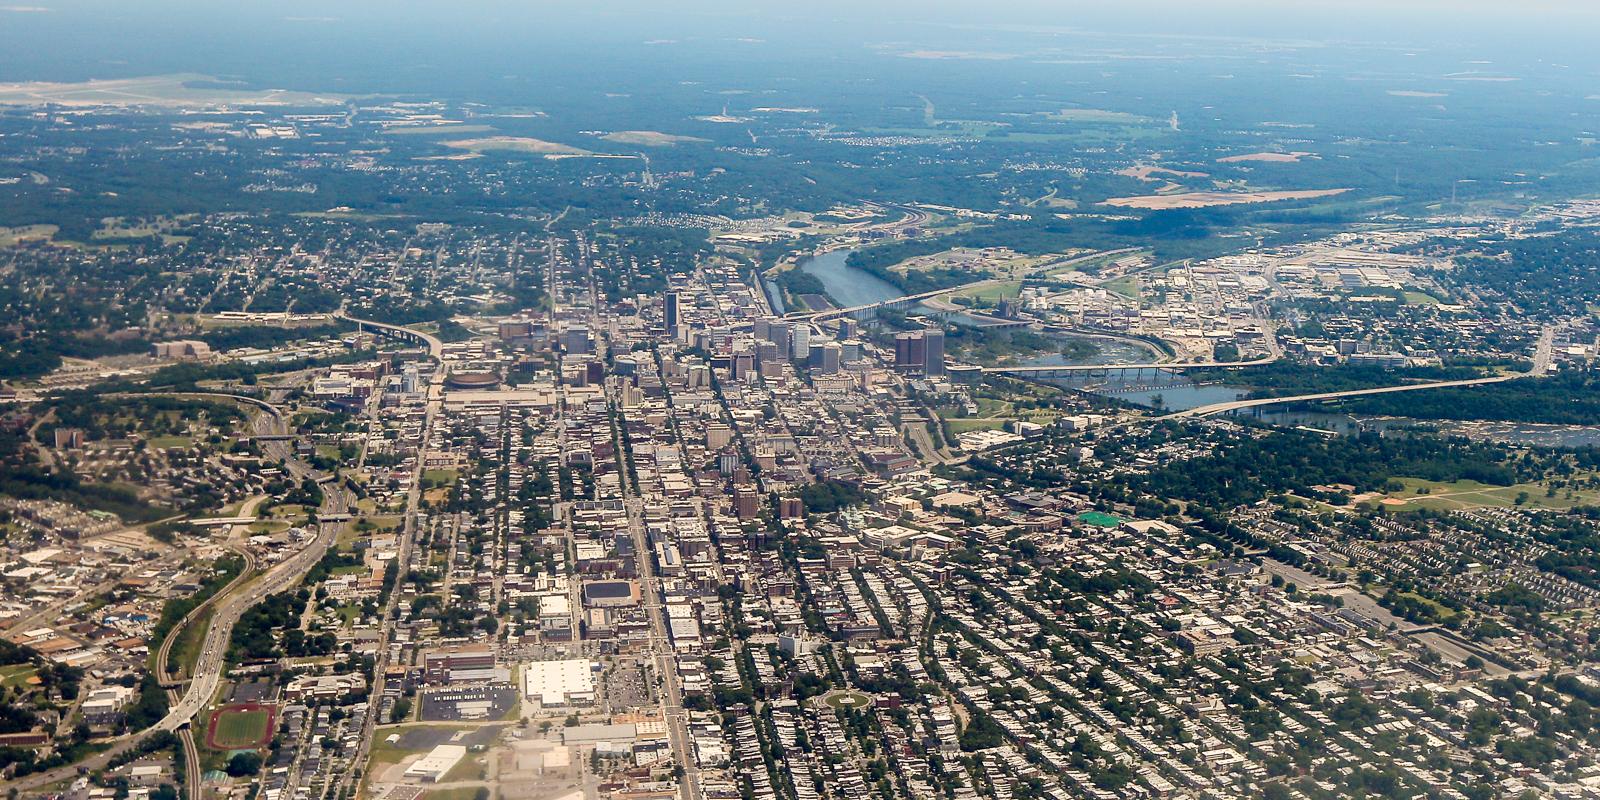 160620-rva-aerial-view-0007-web-ready